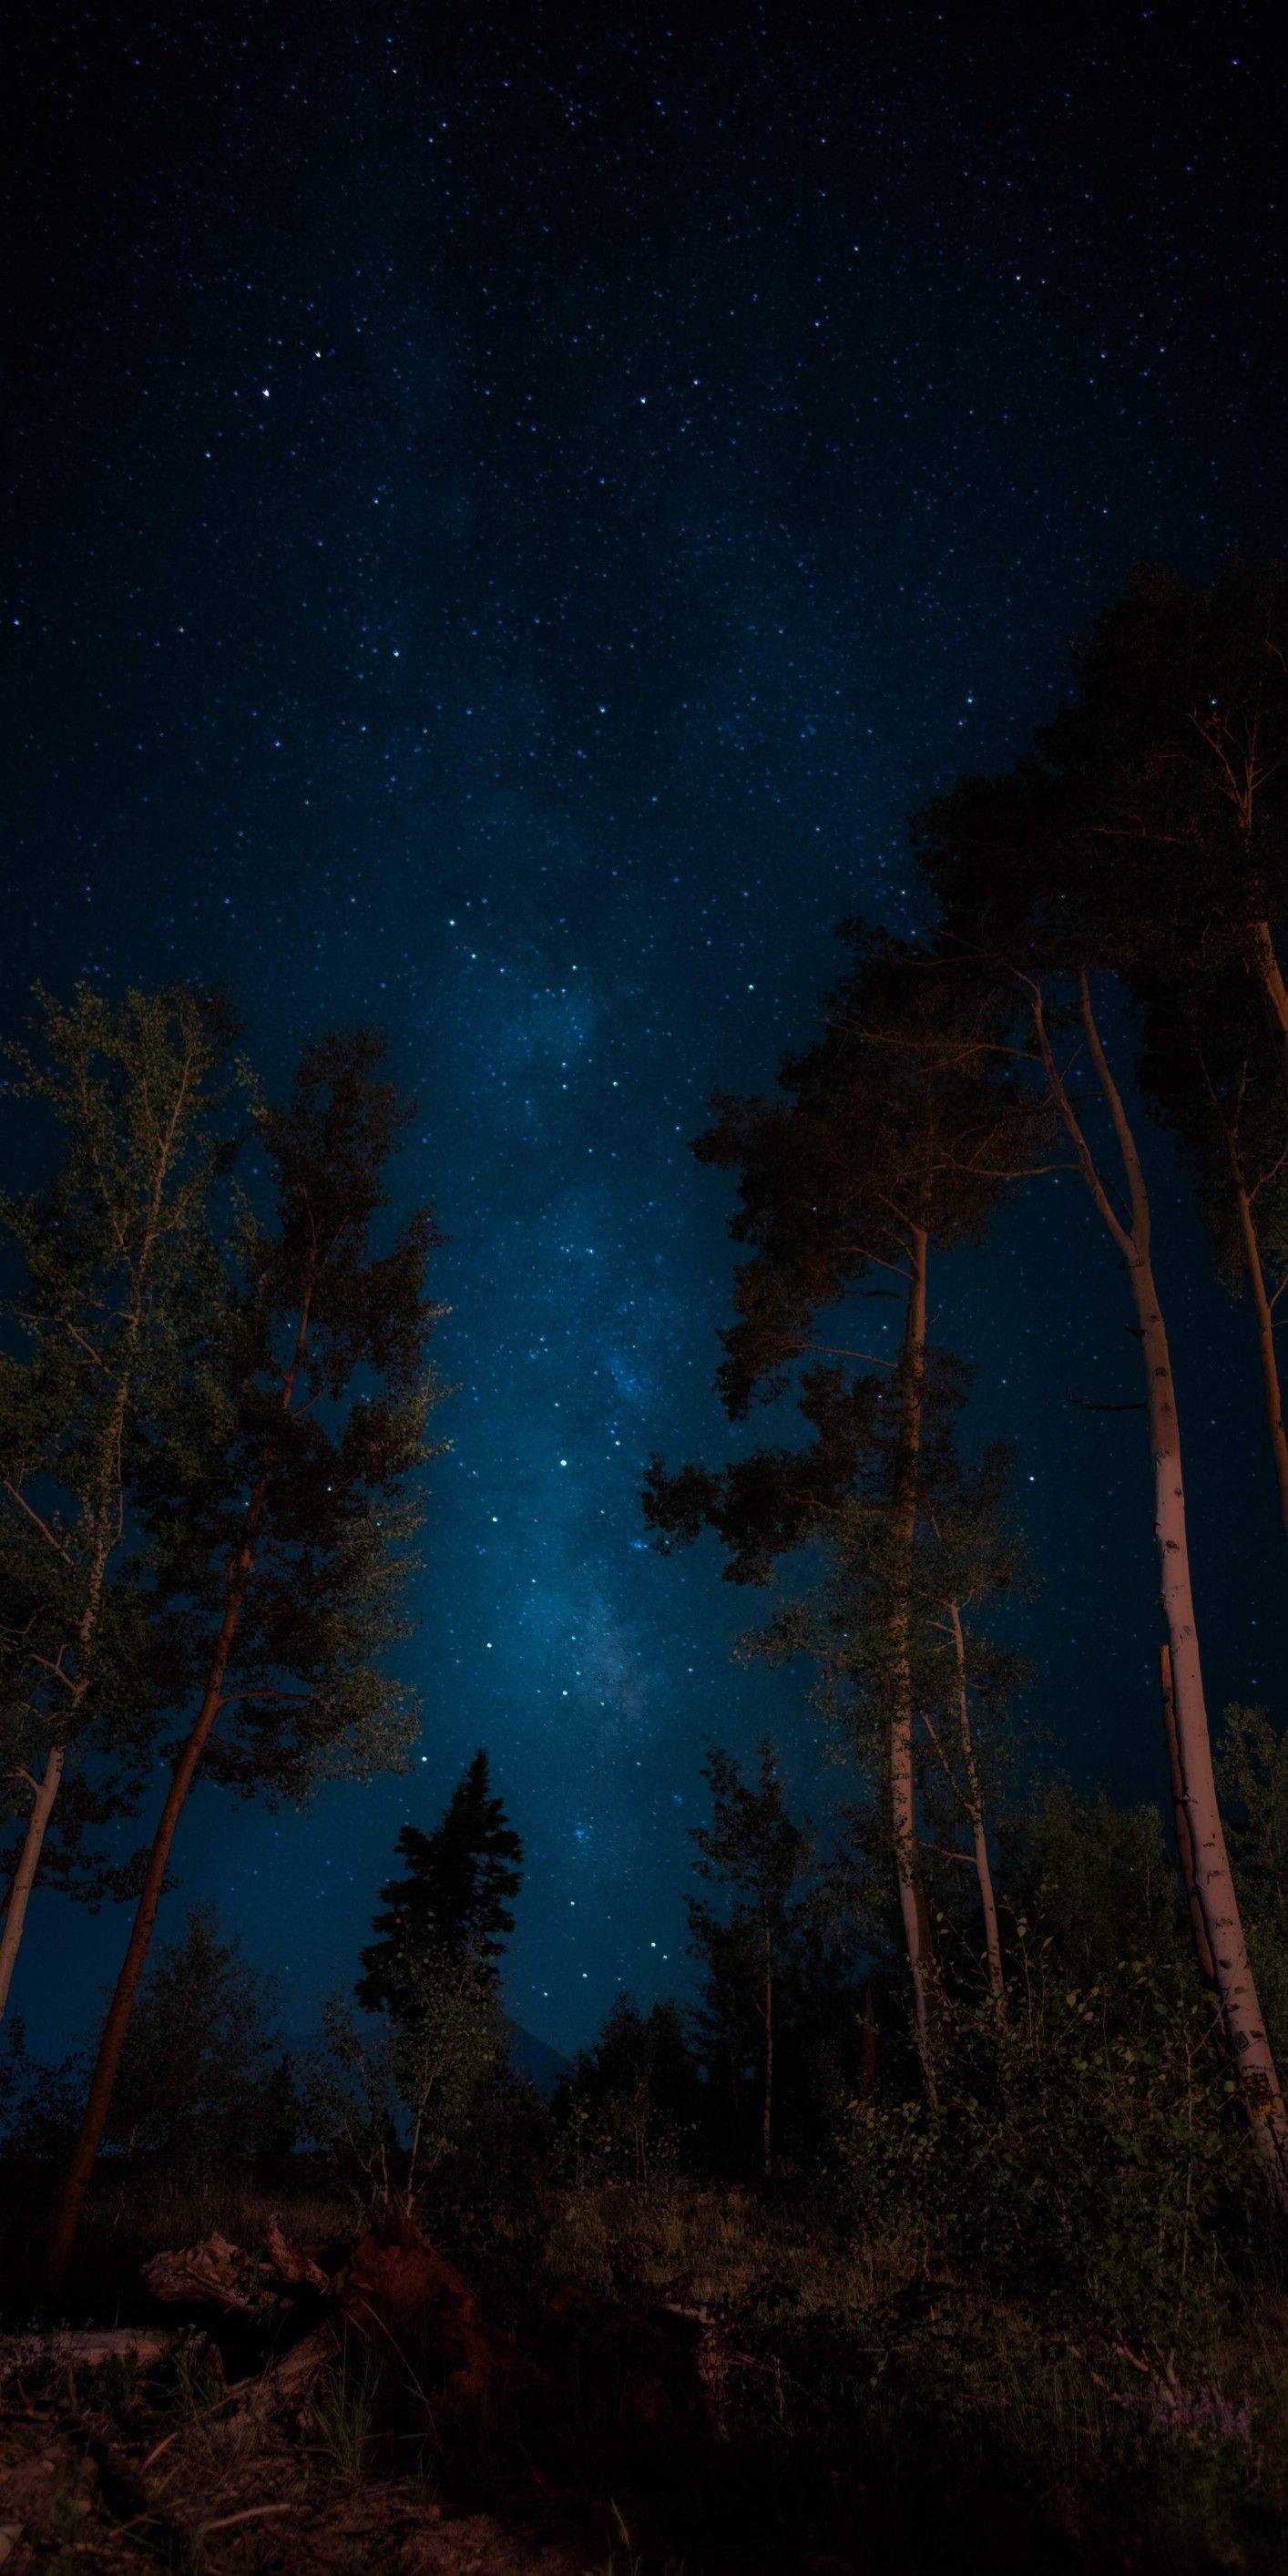 Pin By Iyan Sofyan On Sfe Universe Pictures Iphone Wallpaper Sky Night Sky Wallpaper Dark Wallpaper